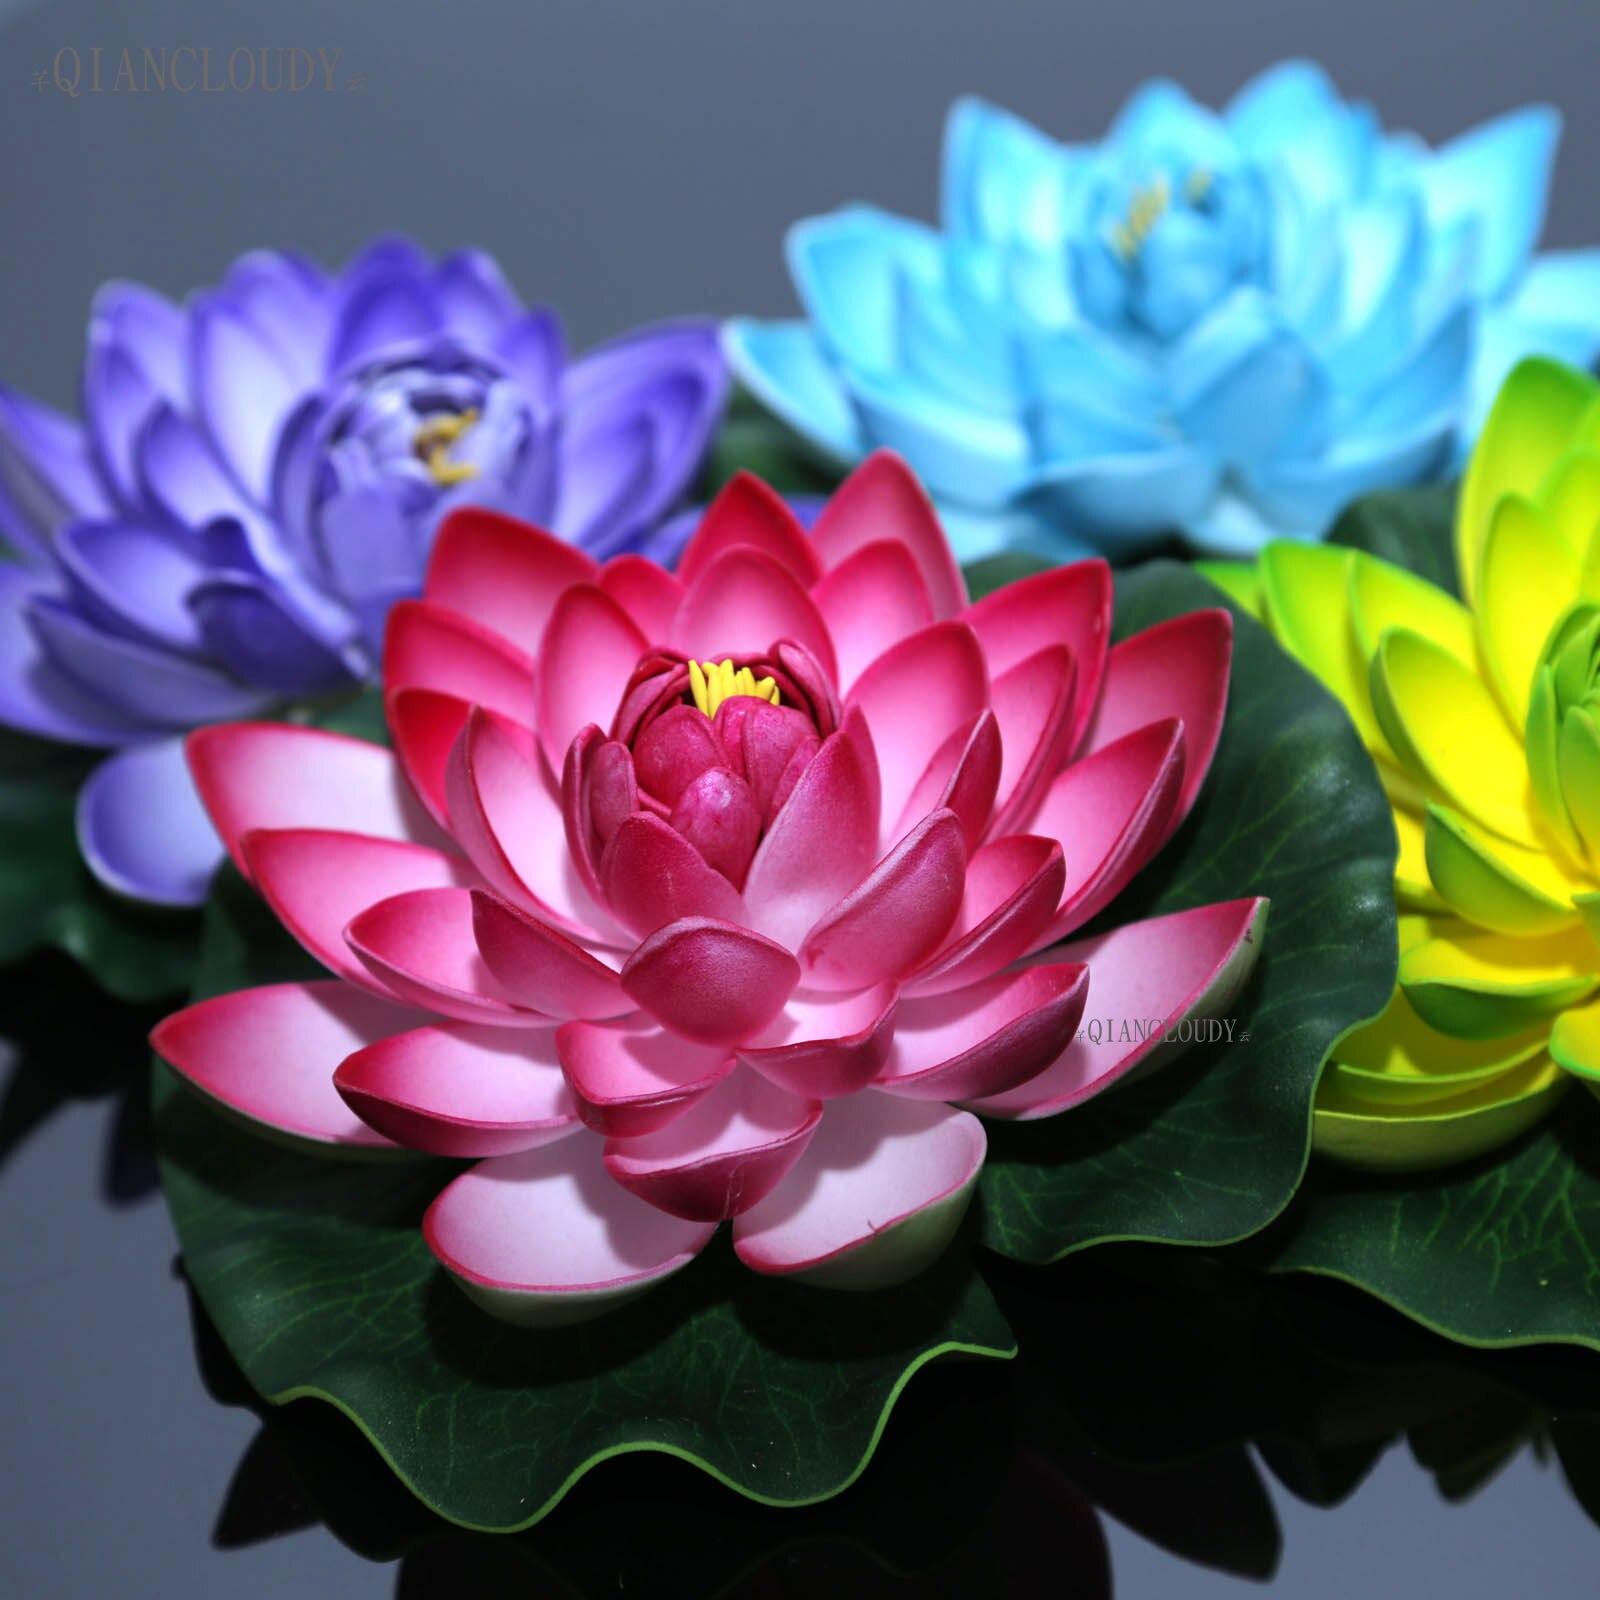 Artificial flor de loto lirio hoja flores piscina flotante estanque flores boda decoración jardín 17CM B12